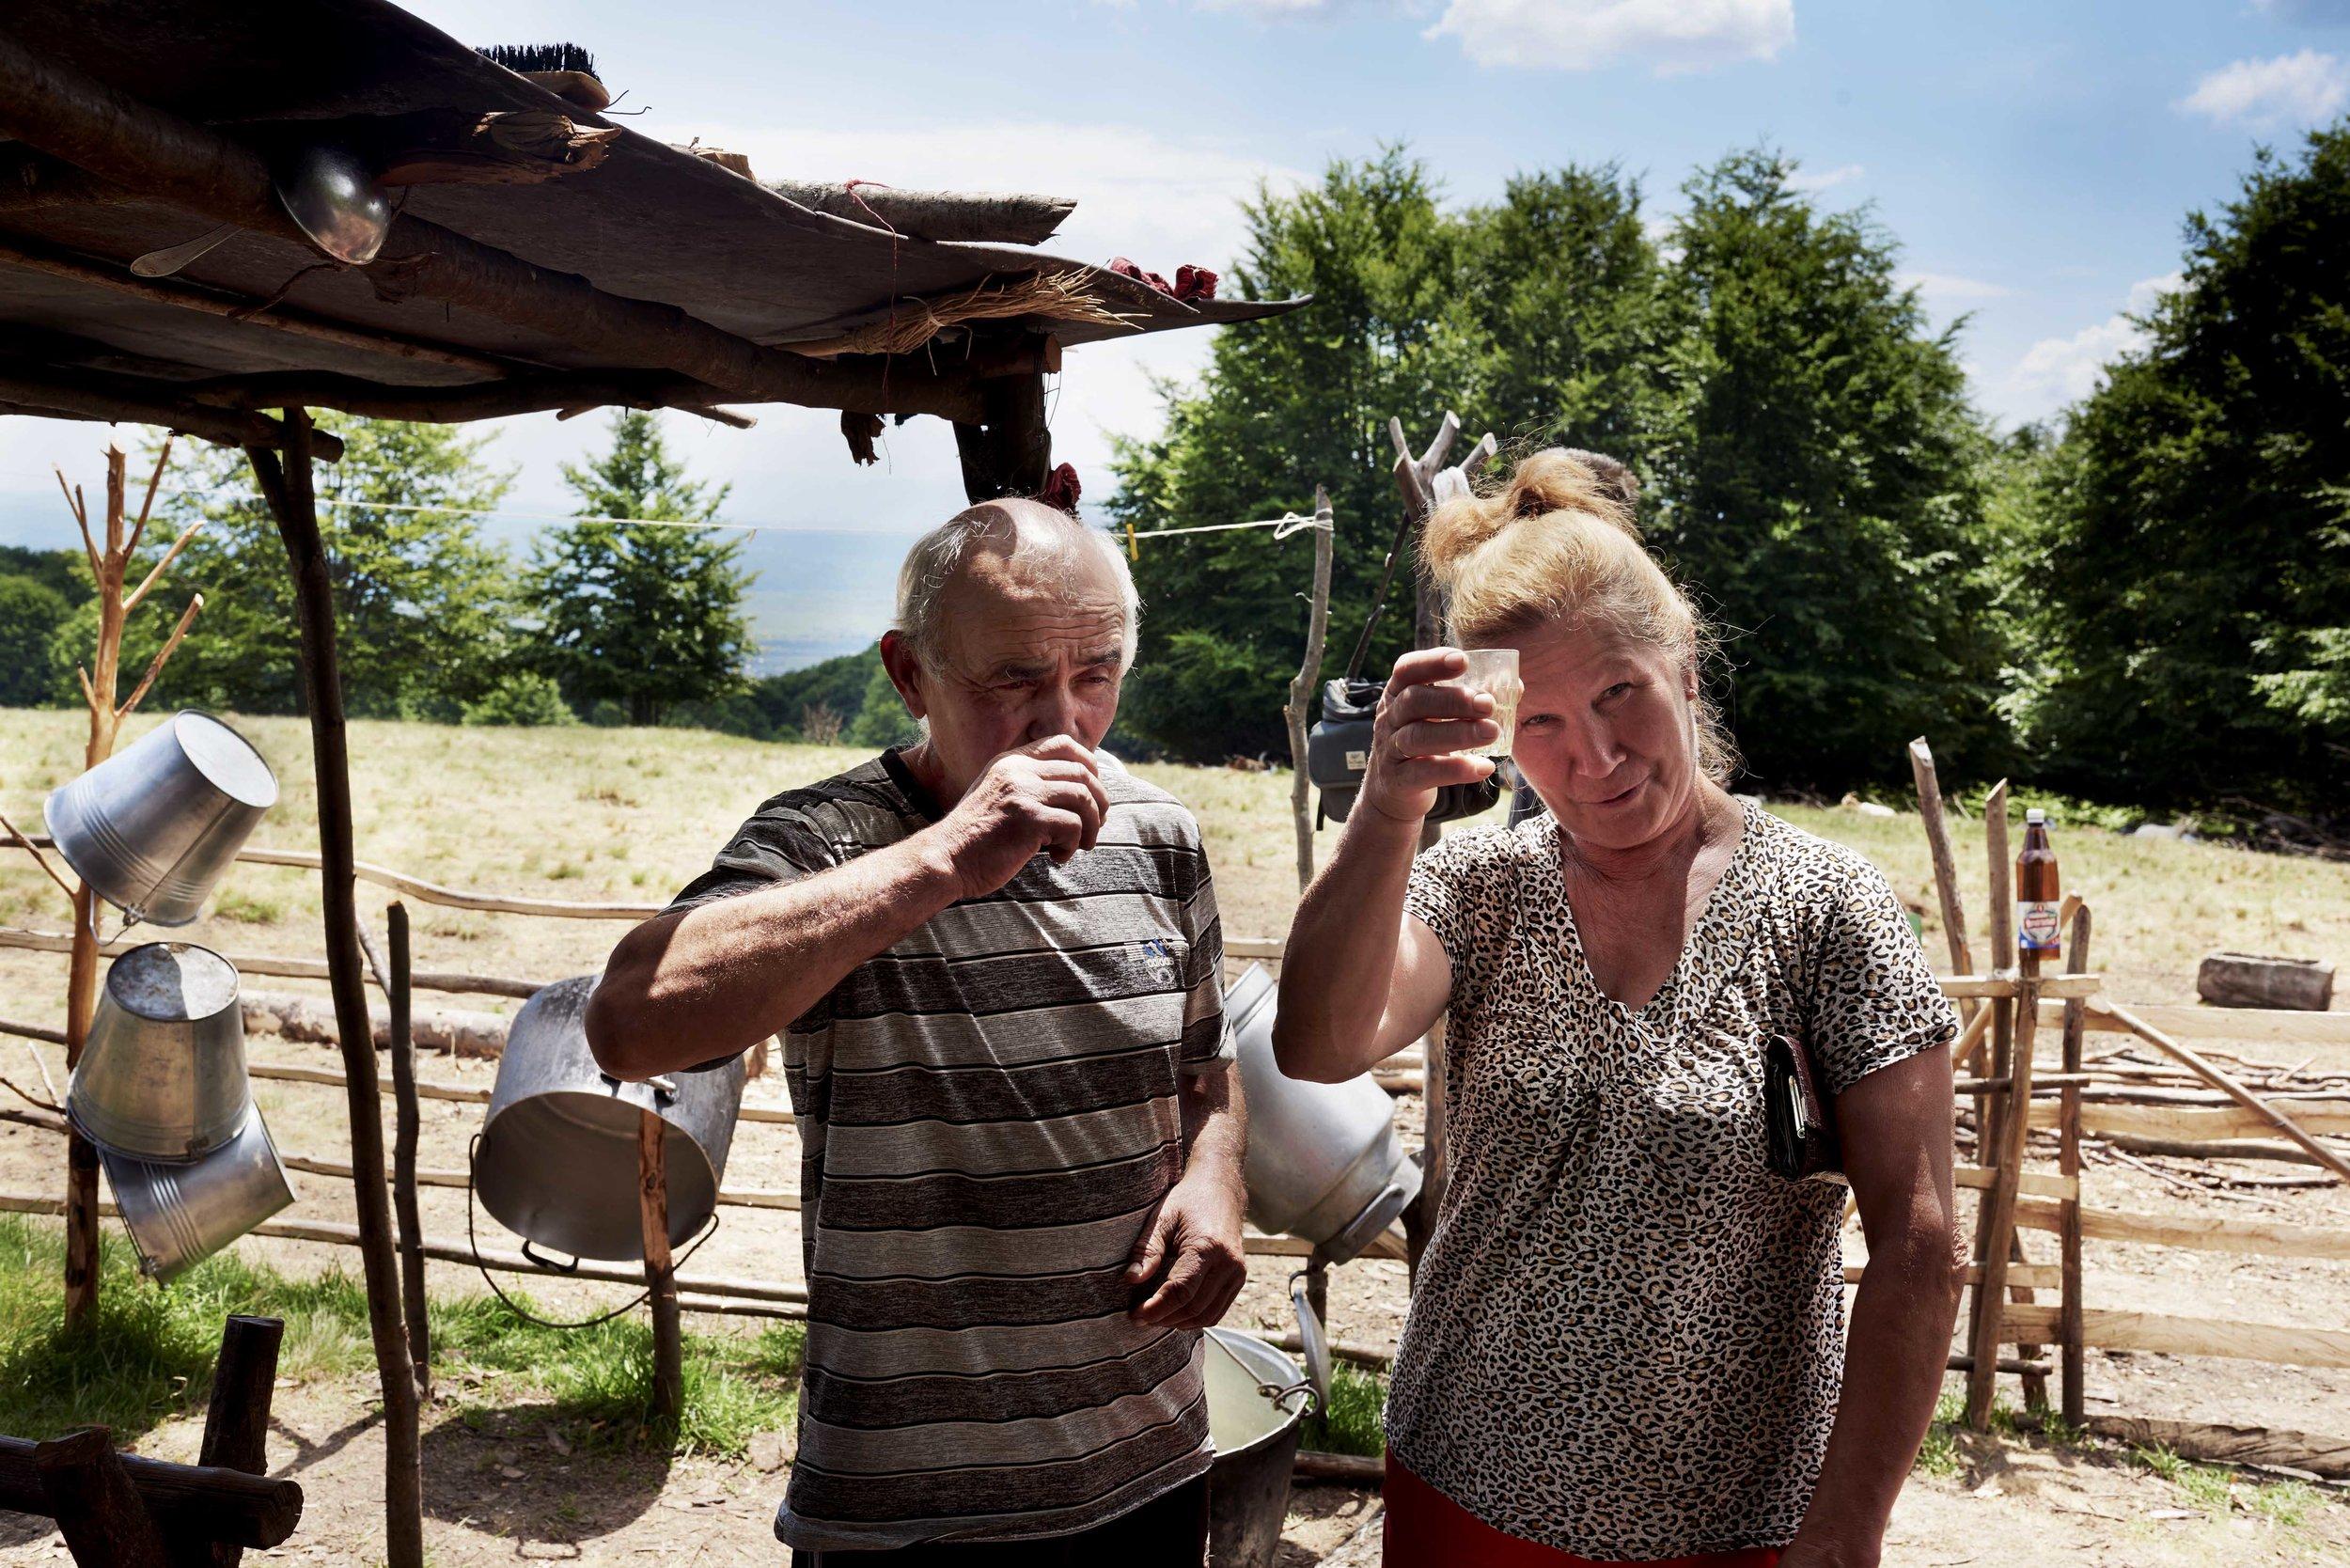 2017_06_09_EXPERIENCE_UKRAINE_OLIA_HERCULES_59723.jpg